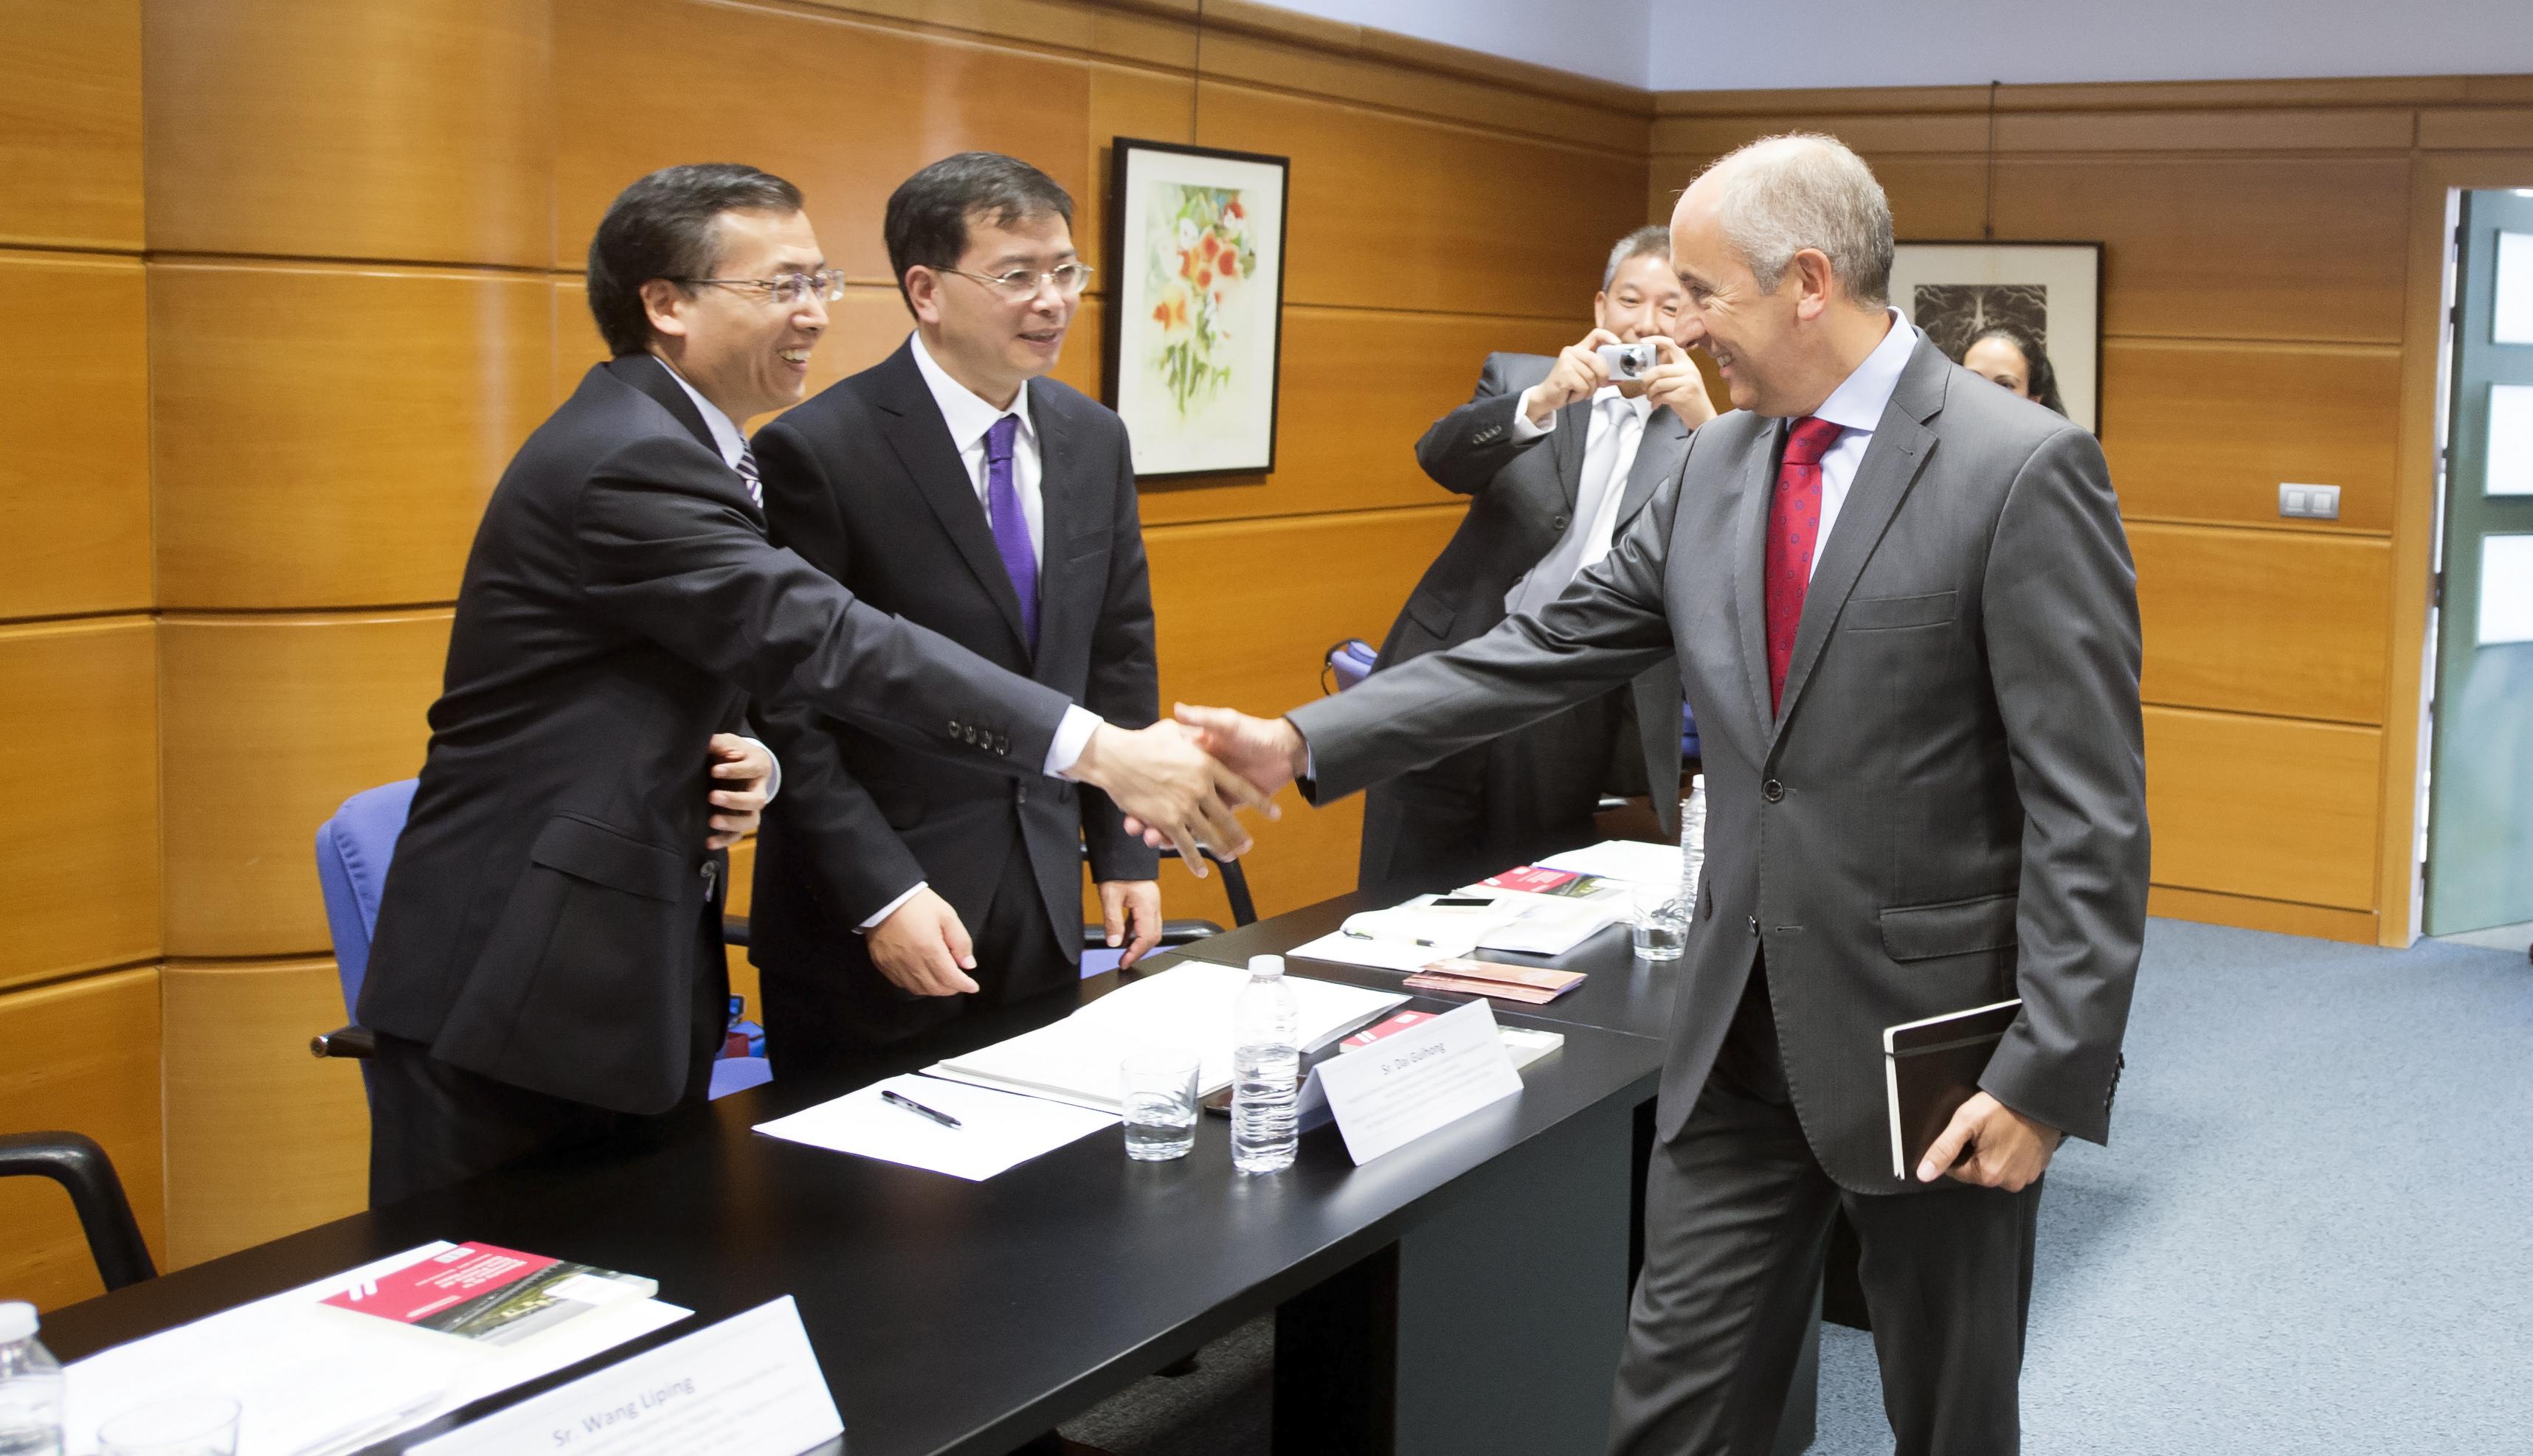 2015_09_09_erkoreka_delegacion_china.jpg